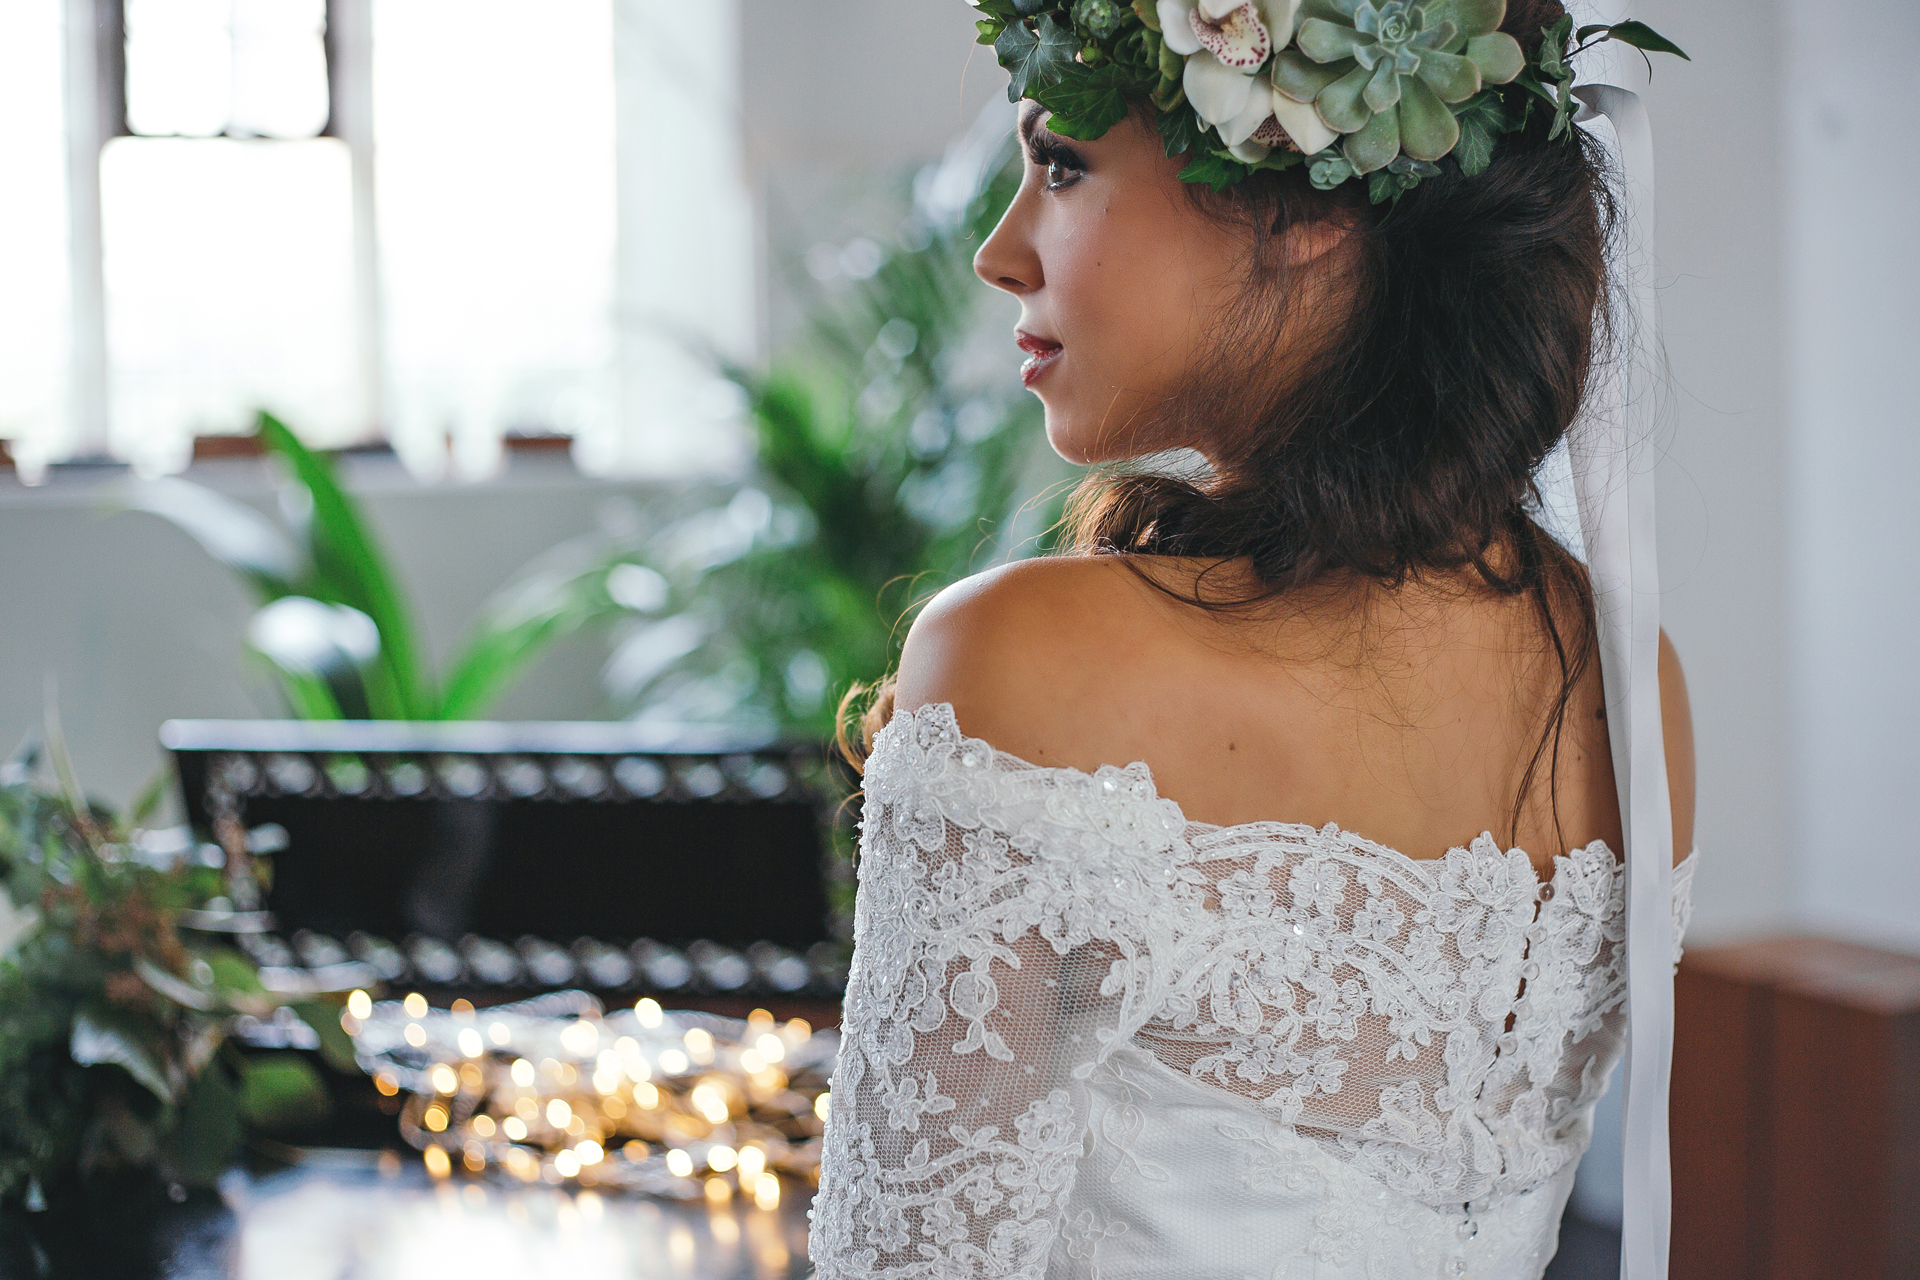 norfolk_wedding_photographer _norwich_anglia_documentary_reportage_storybook (15).jpg